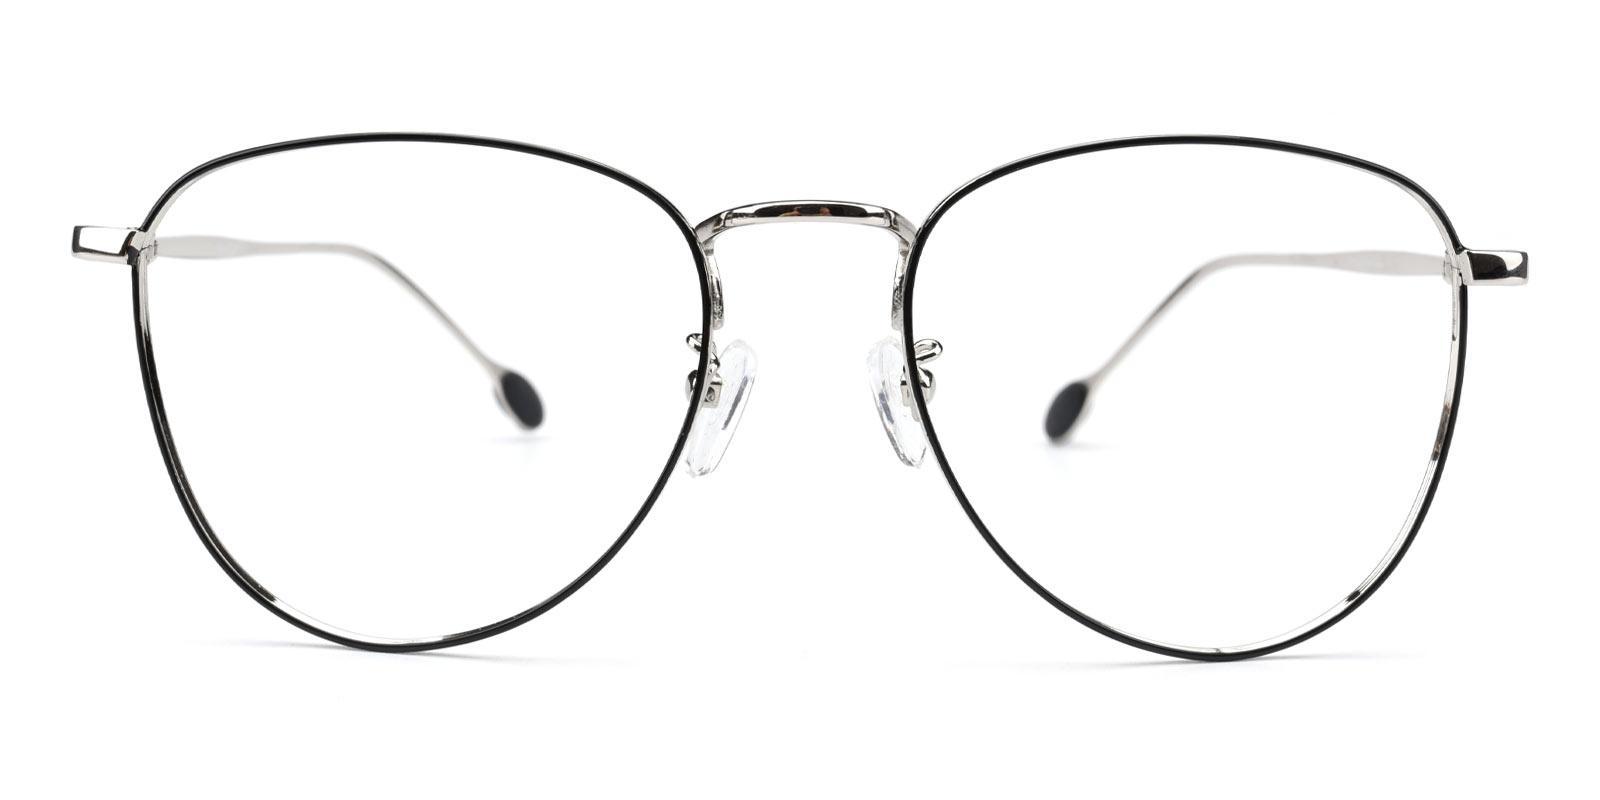 Bernice-Silver-Aviator-Metal-Eyeglasses-detail